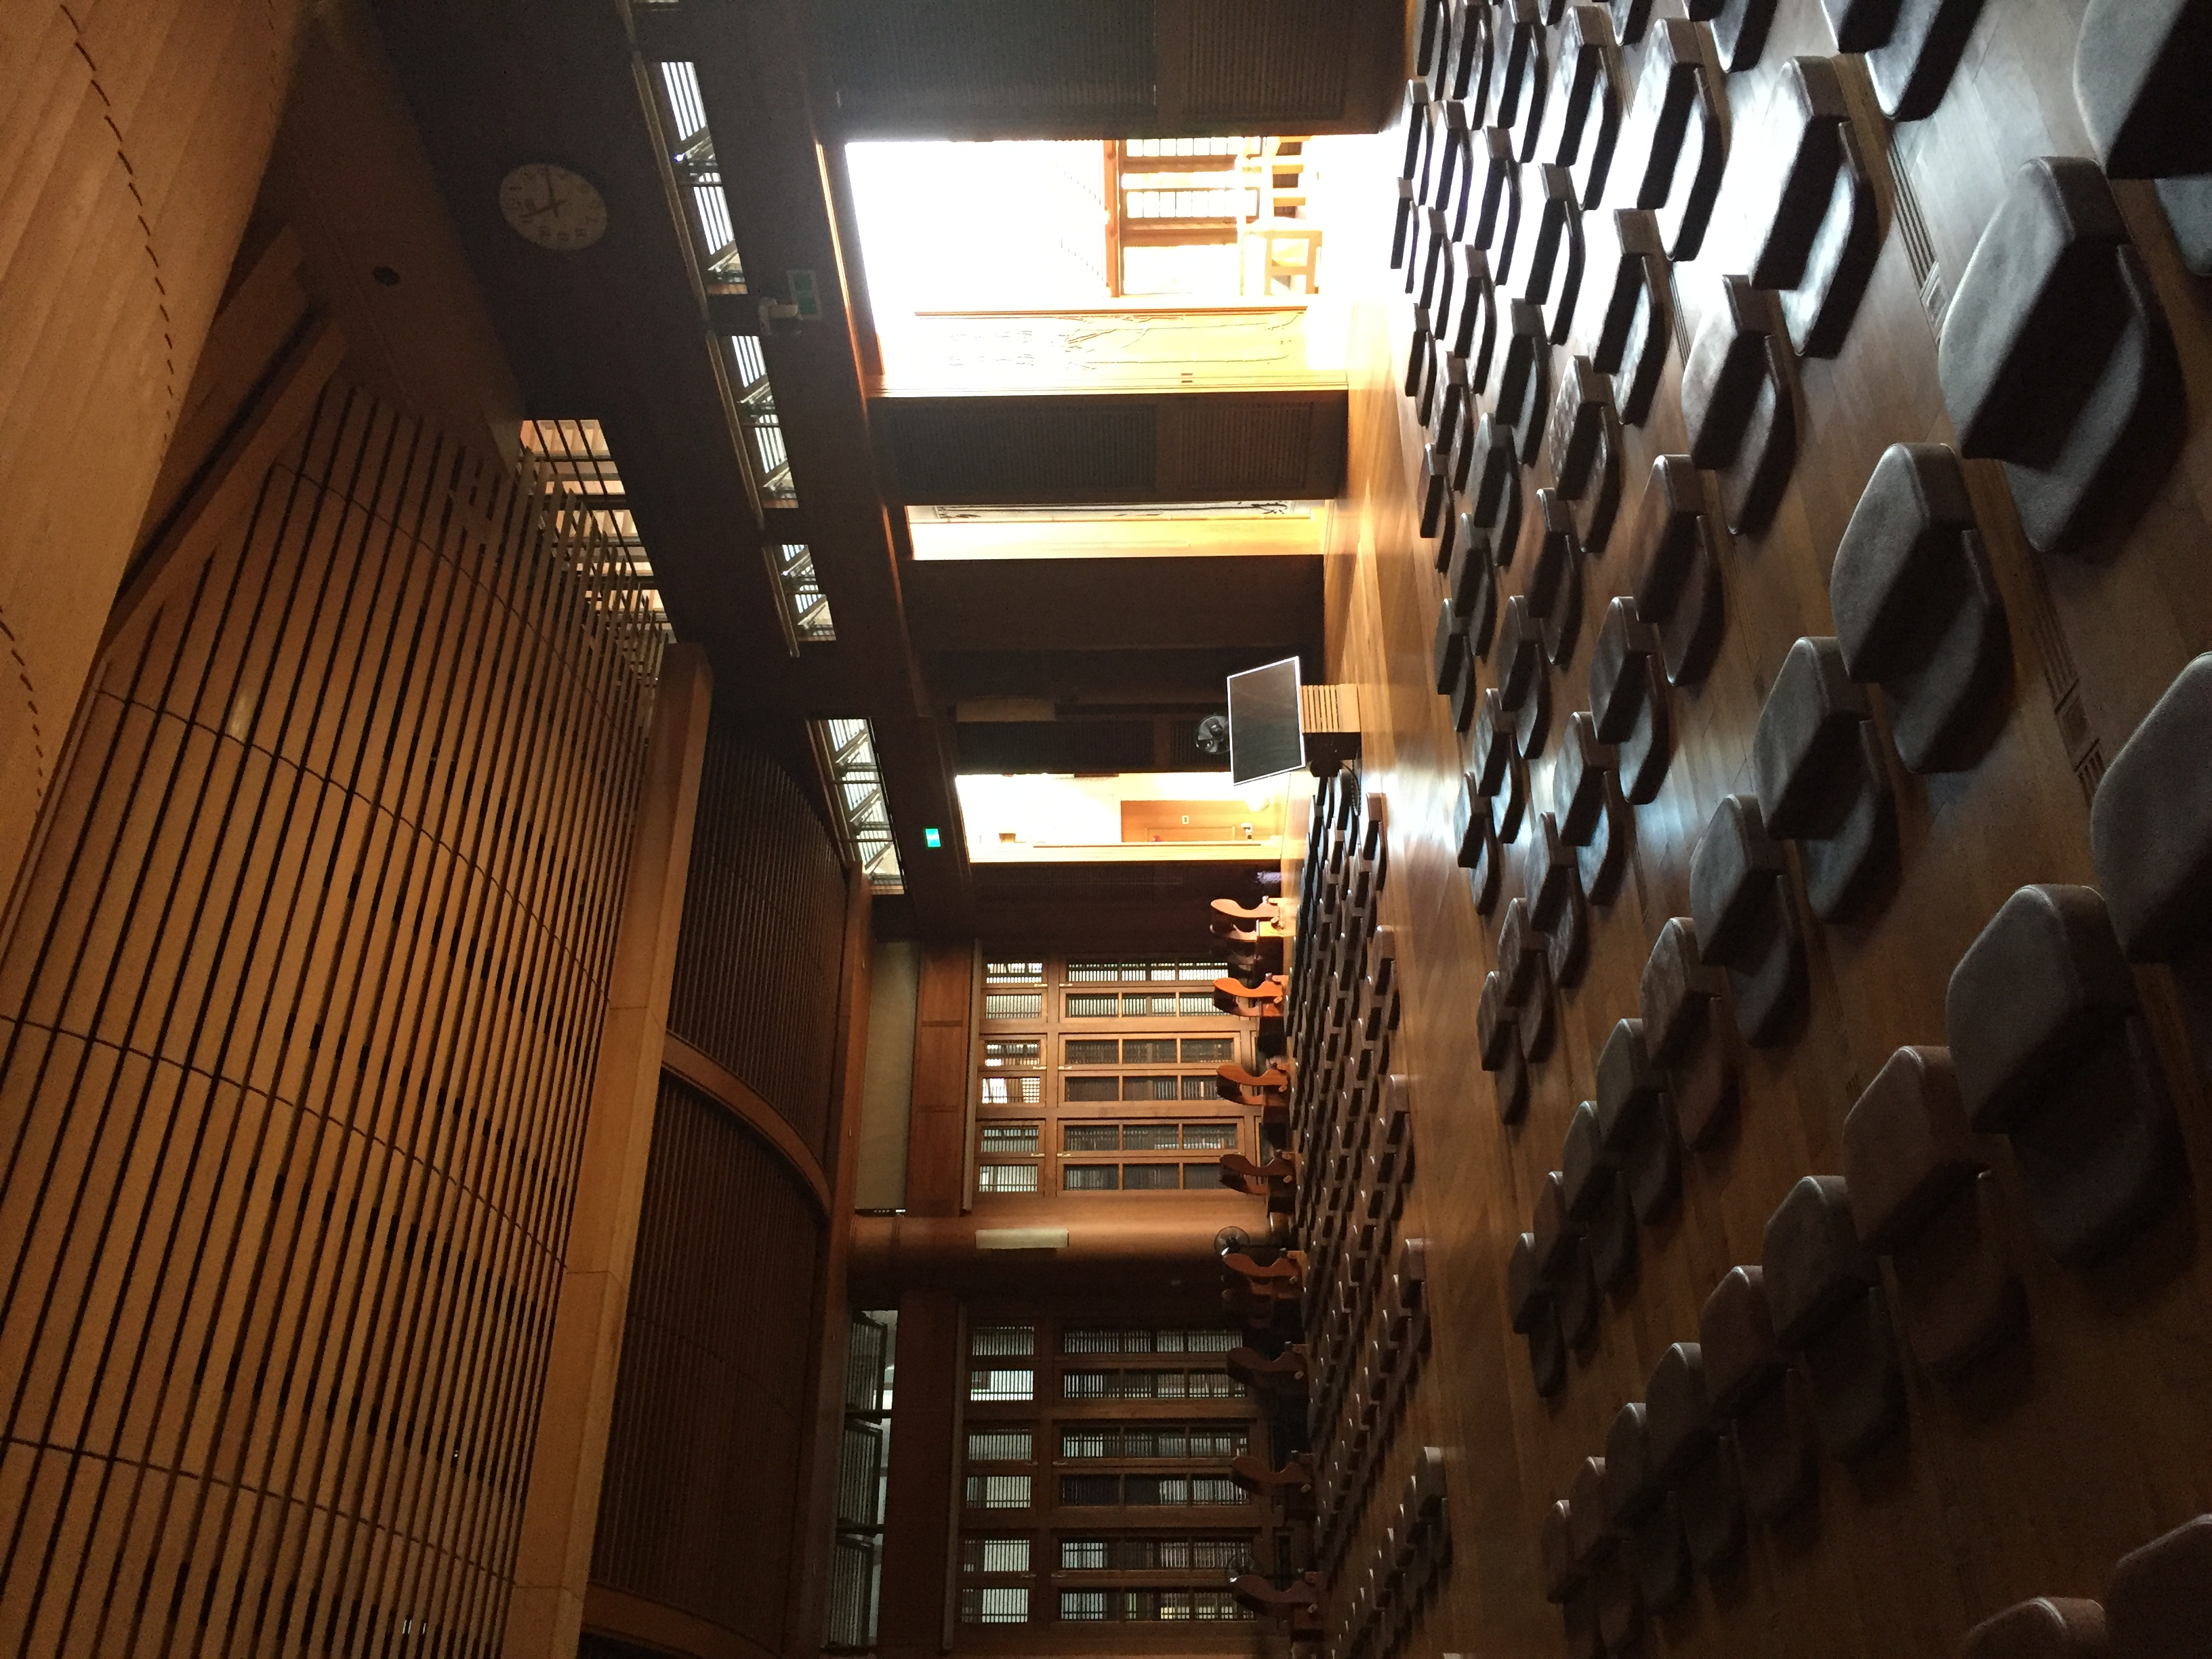 Tzu Chi HQ in Hualien, Taiwan